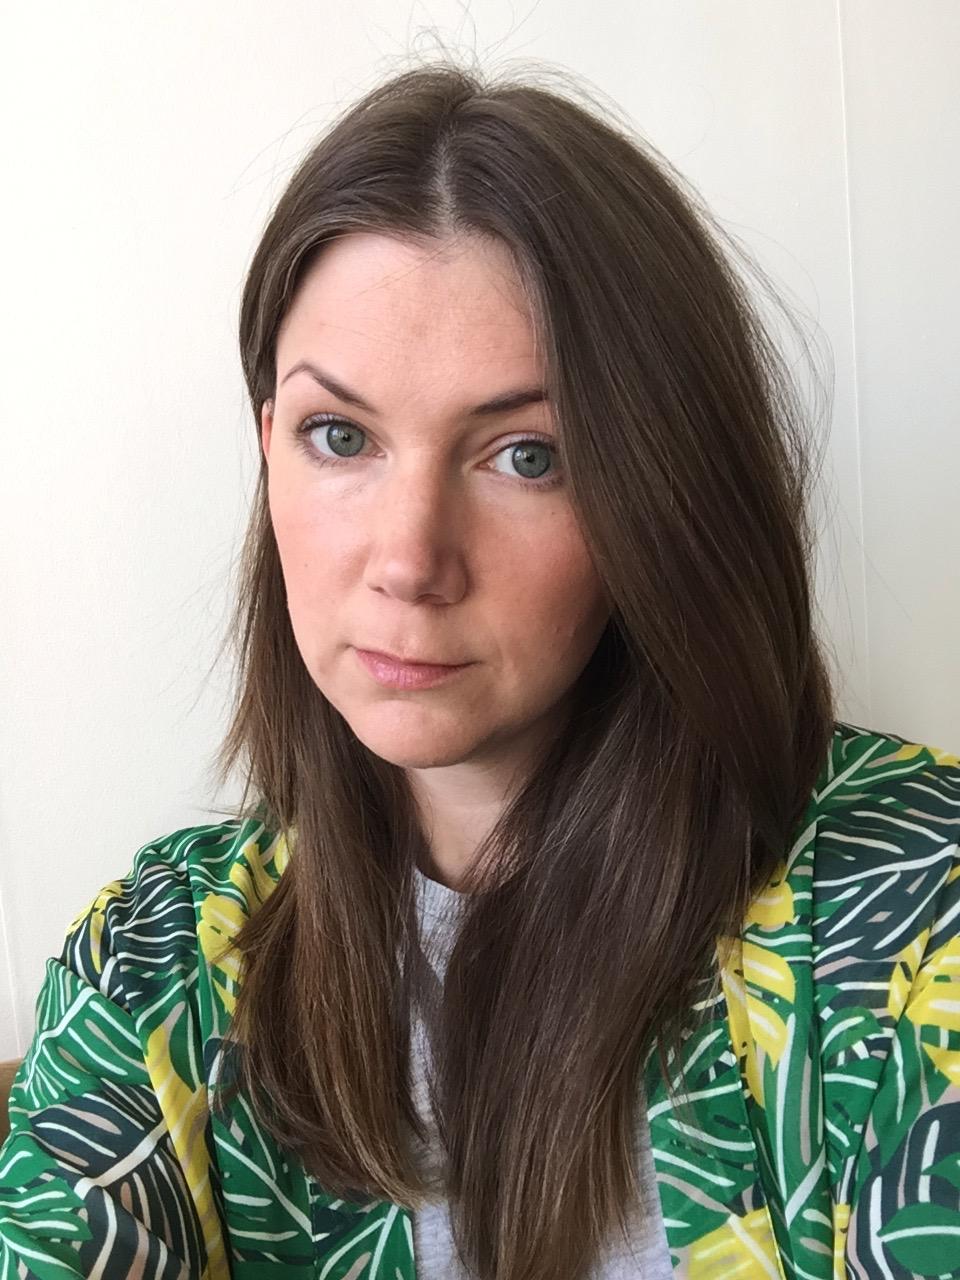 - To see more of Filippa visit her website www.filippasmedhagen.com or follow her on Instagram @makeupartistfilippasmedhagen